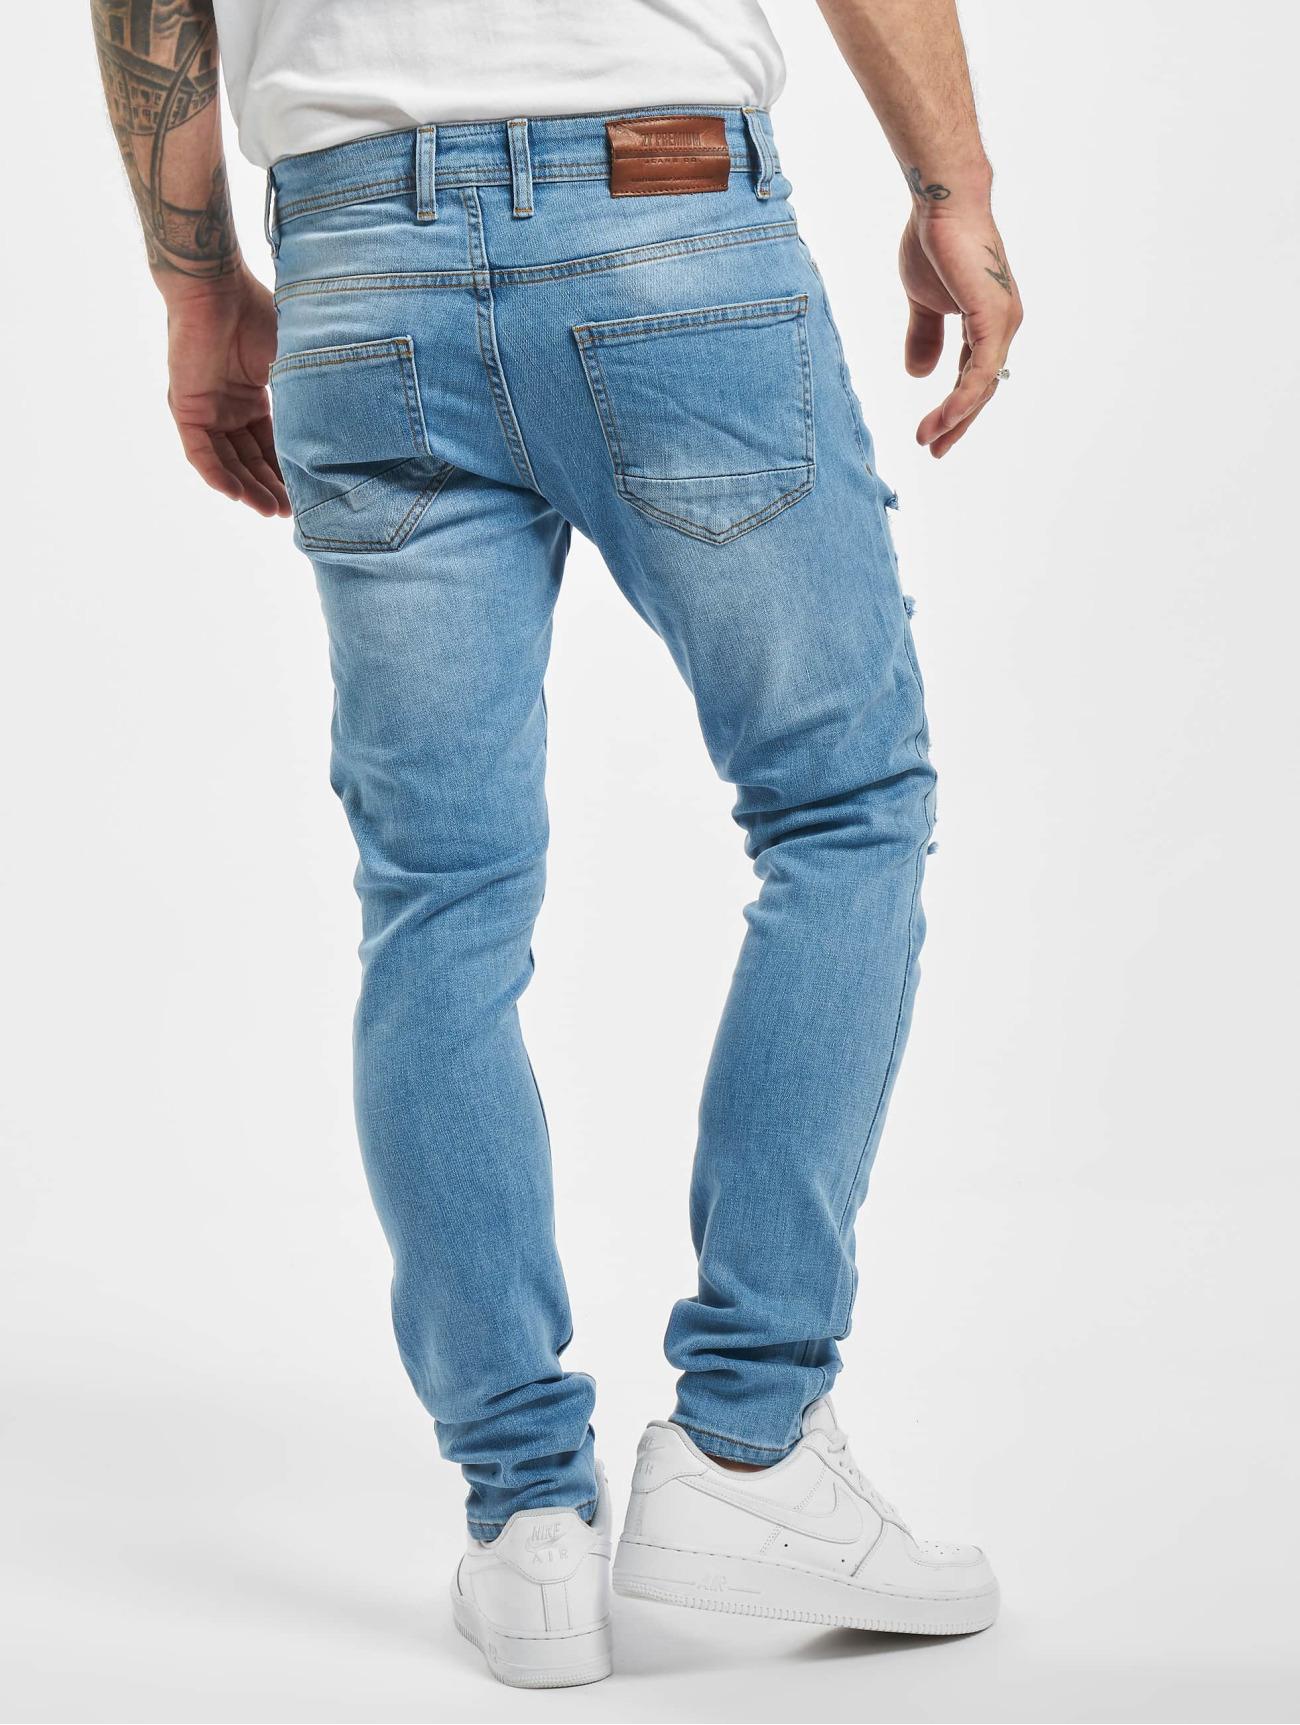 2Y Jeans / Slim Fit Jeans Claudio i blå 765231 Män Jeans